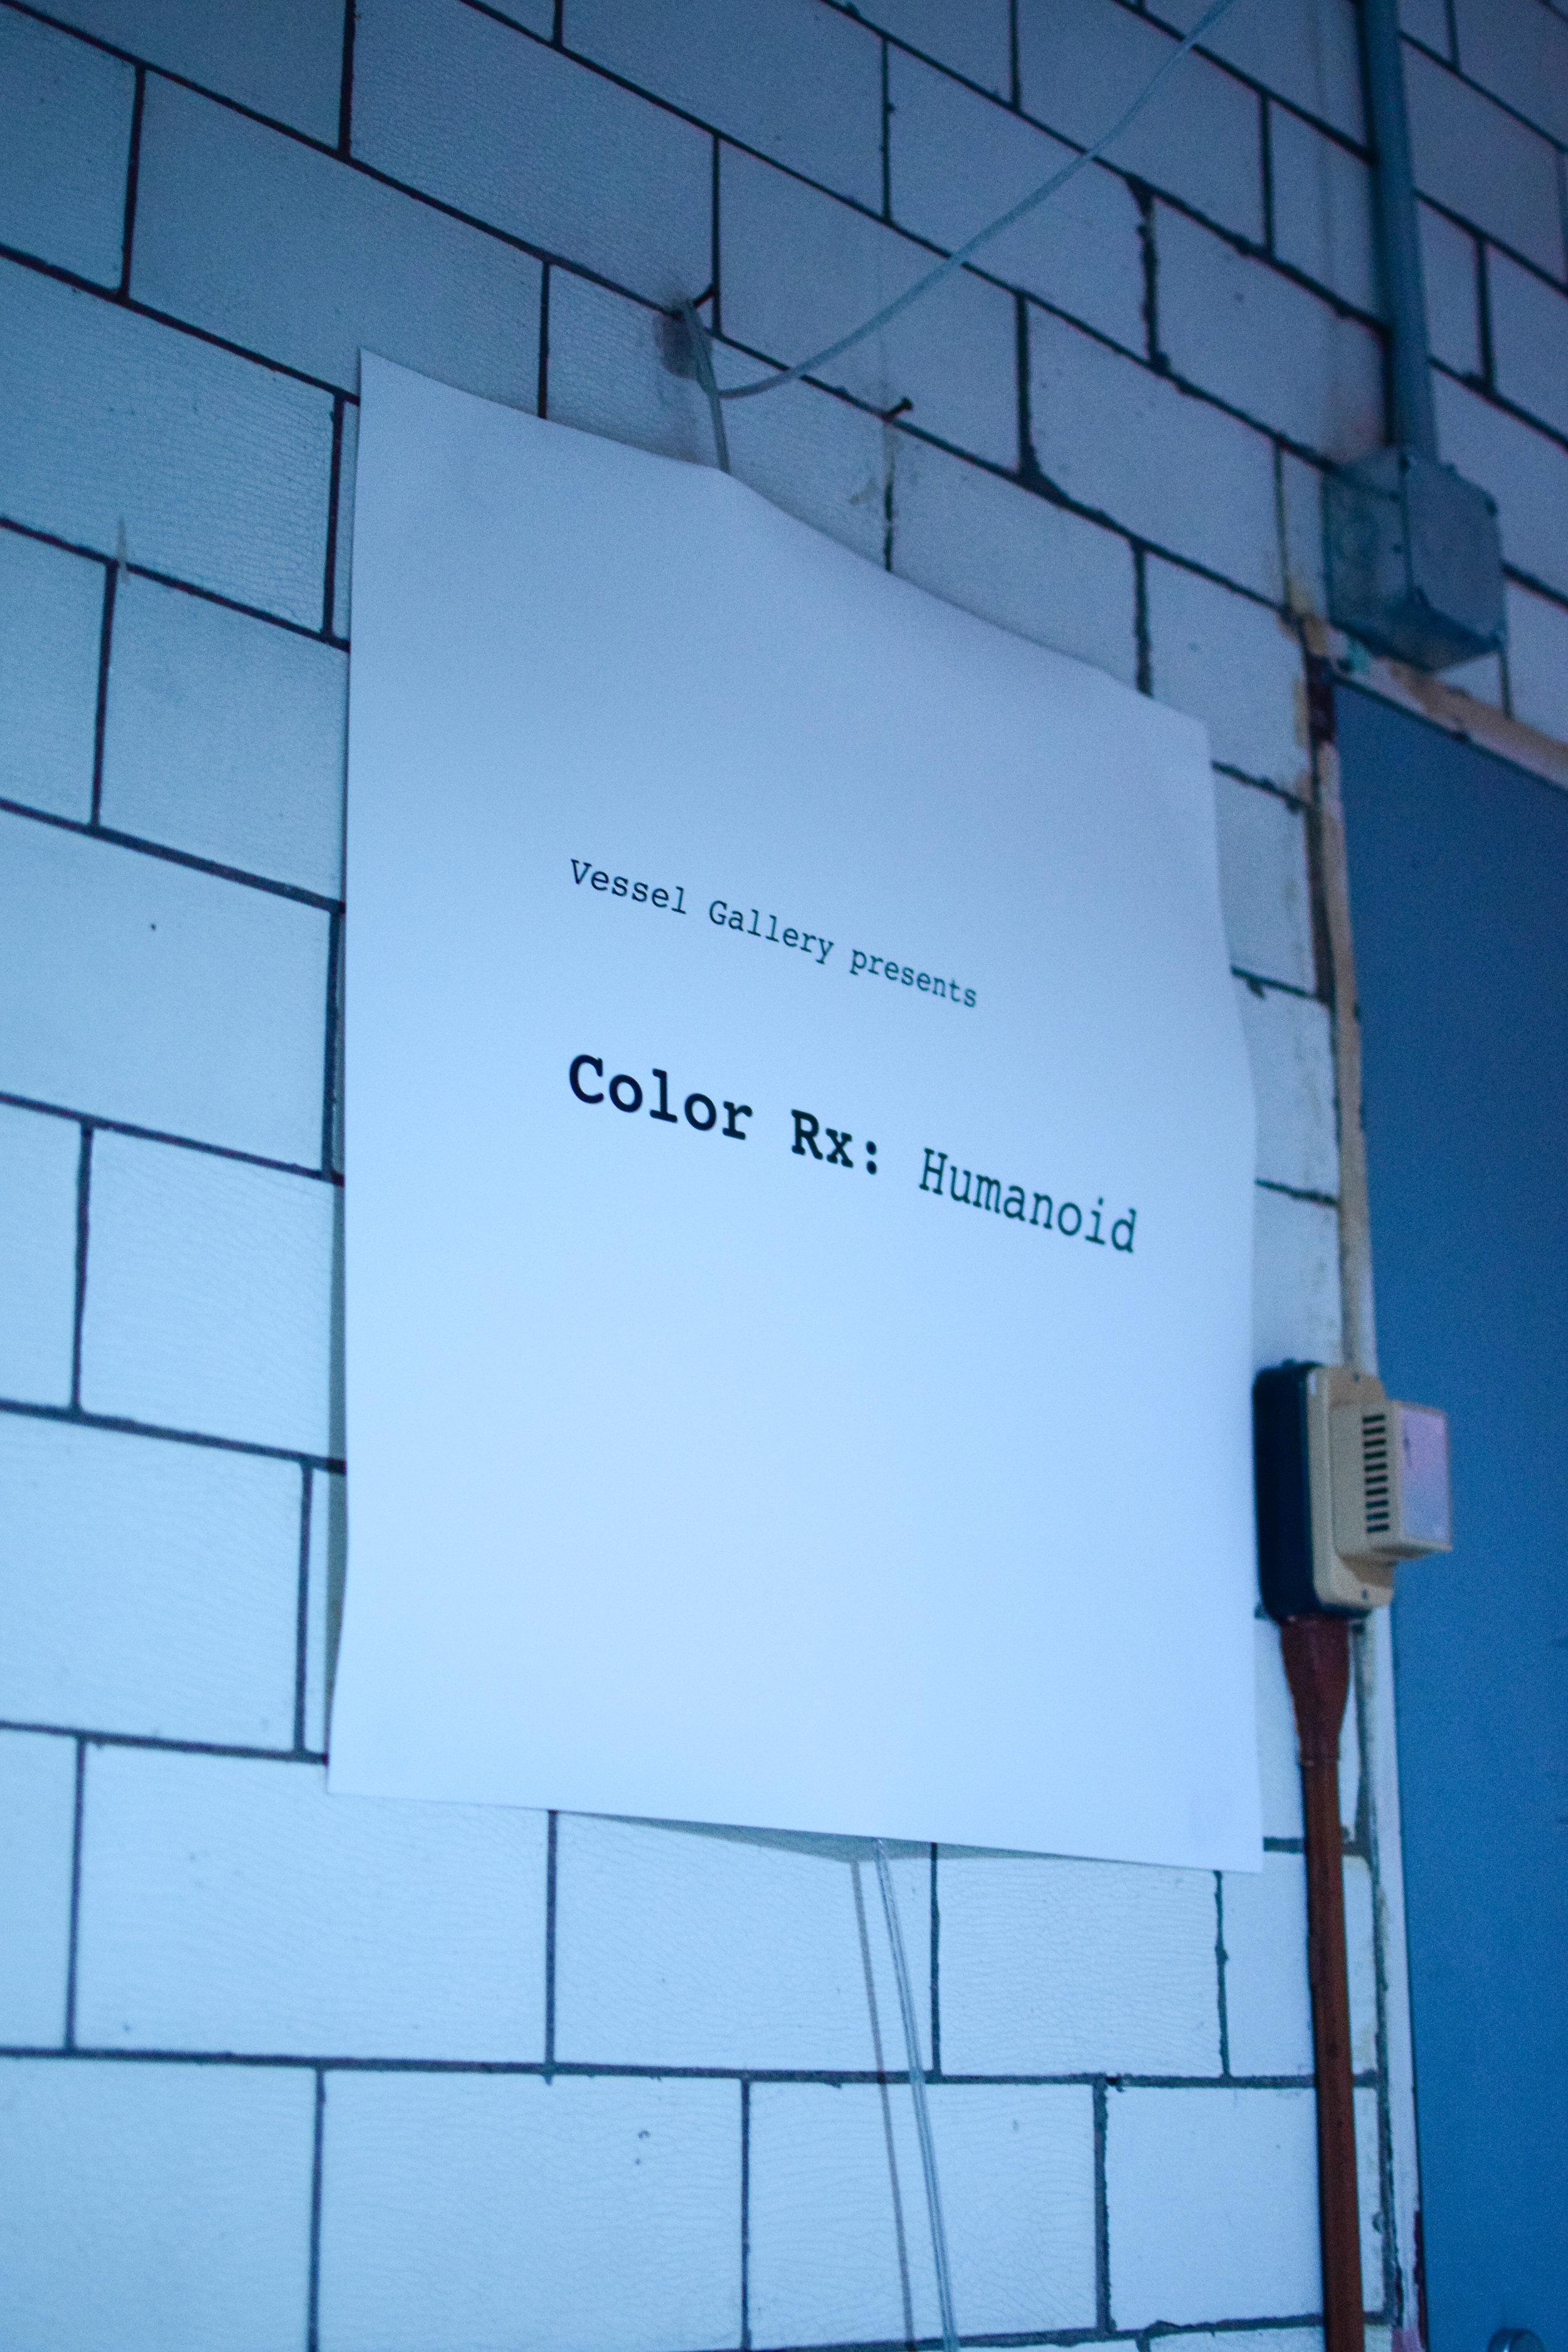 colorrx-0188.jpg